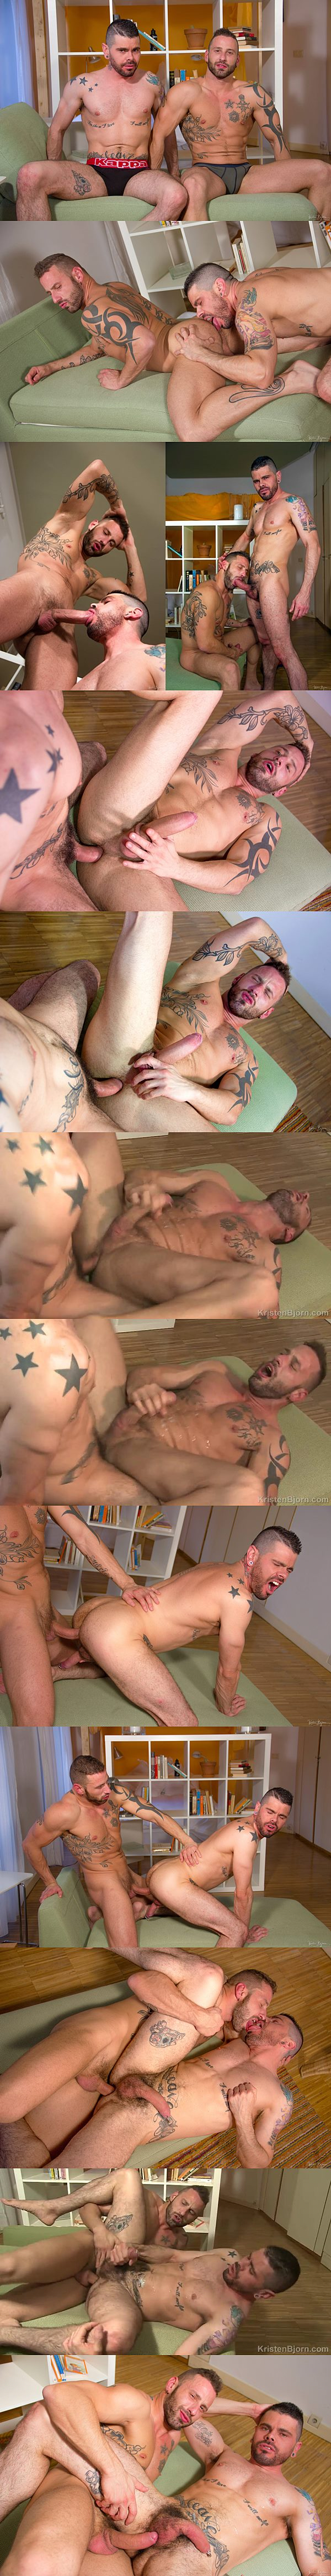 Antonio Miracle & Mario Domenech bareback flip-fuck with big cumshots in Lover's Lane 18 at Kristenbjorn 02